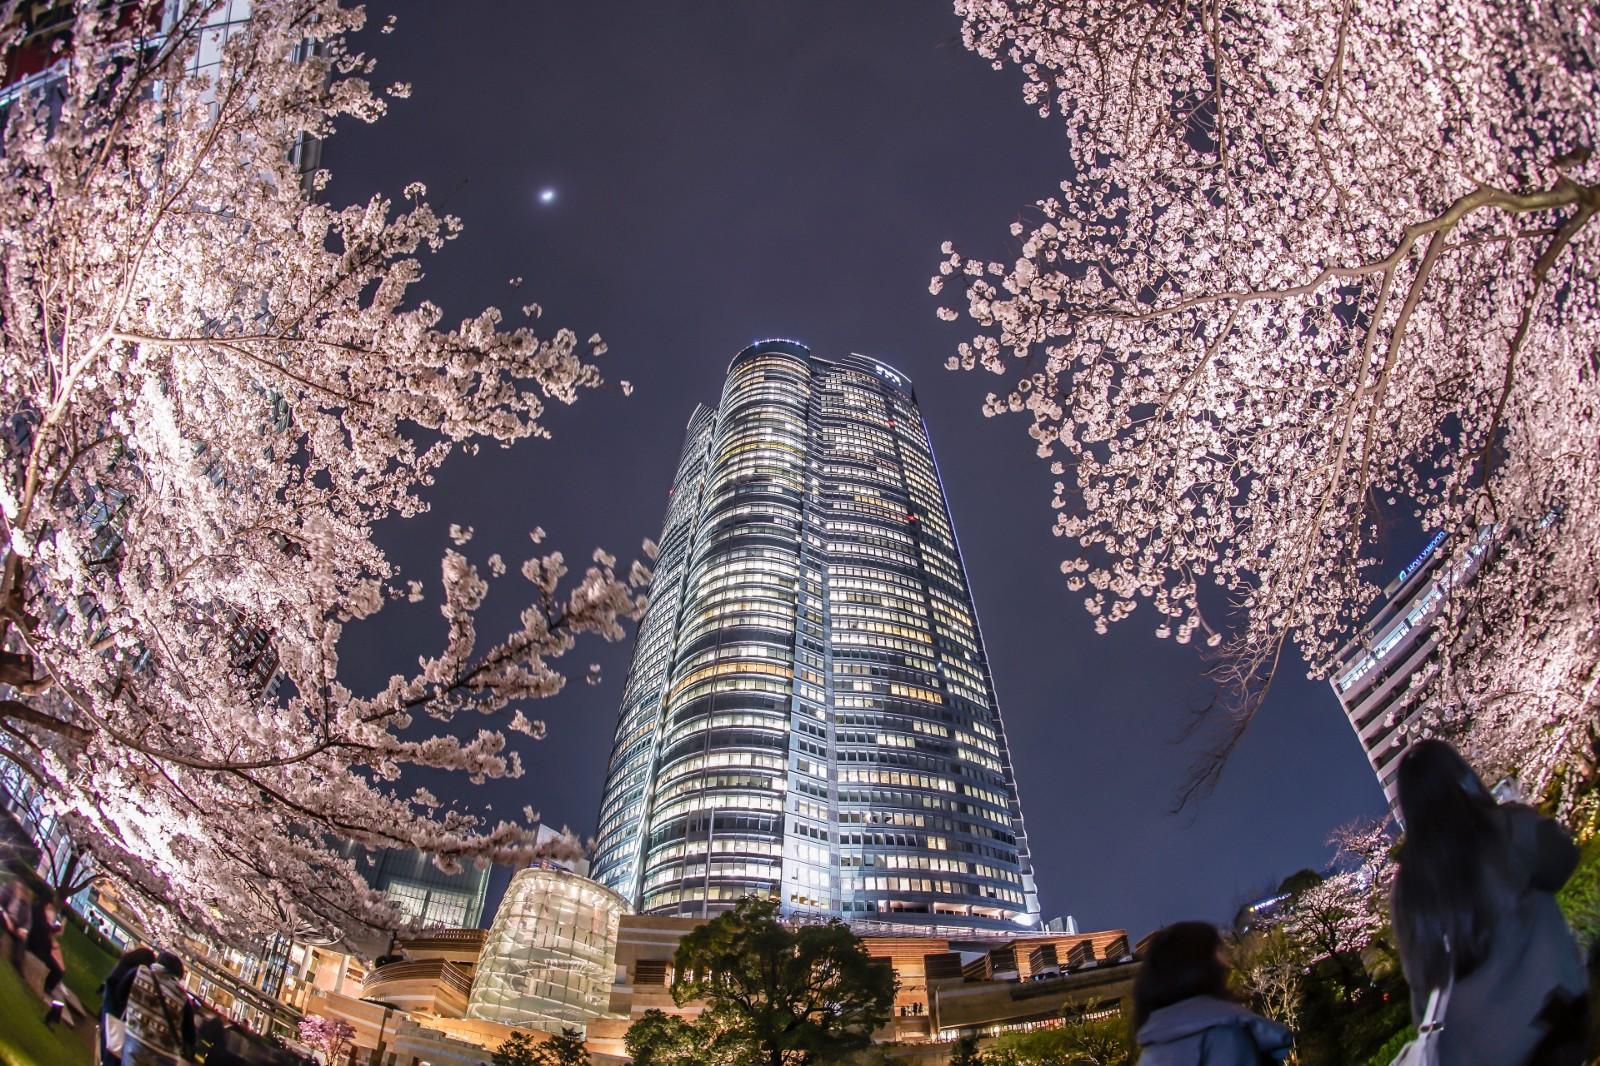 Mori Garden Roppongi Cherry Blossoms 2020